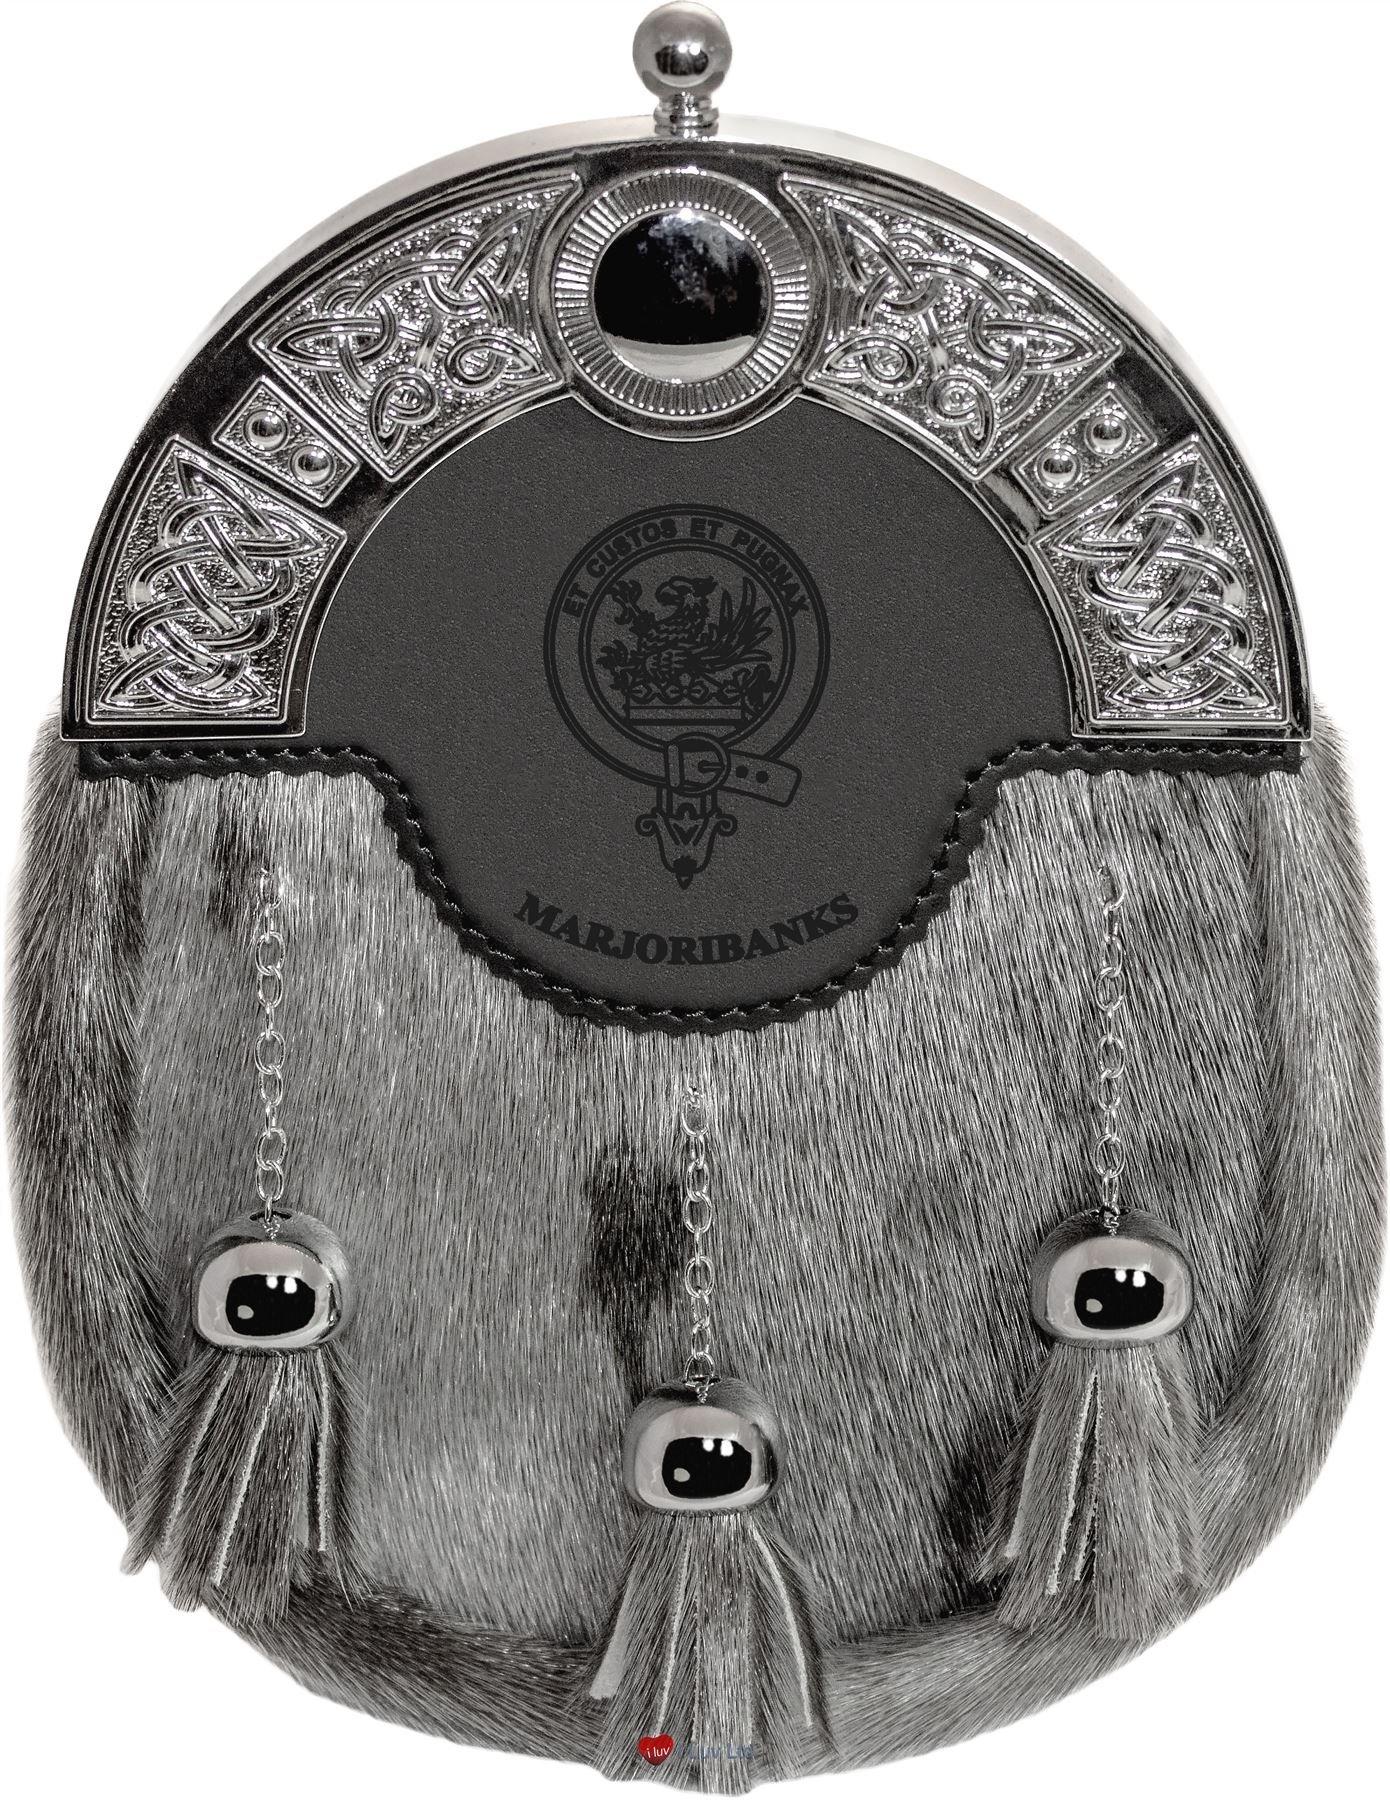 Marjoribanks Dress Sporran 3 Tassels Studded Targe Celtic Arch Scottish Clan Name Crest